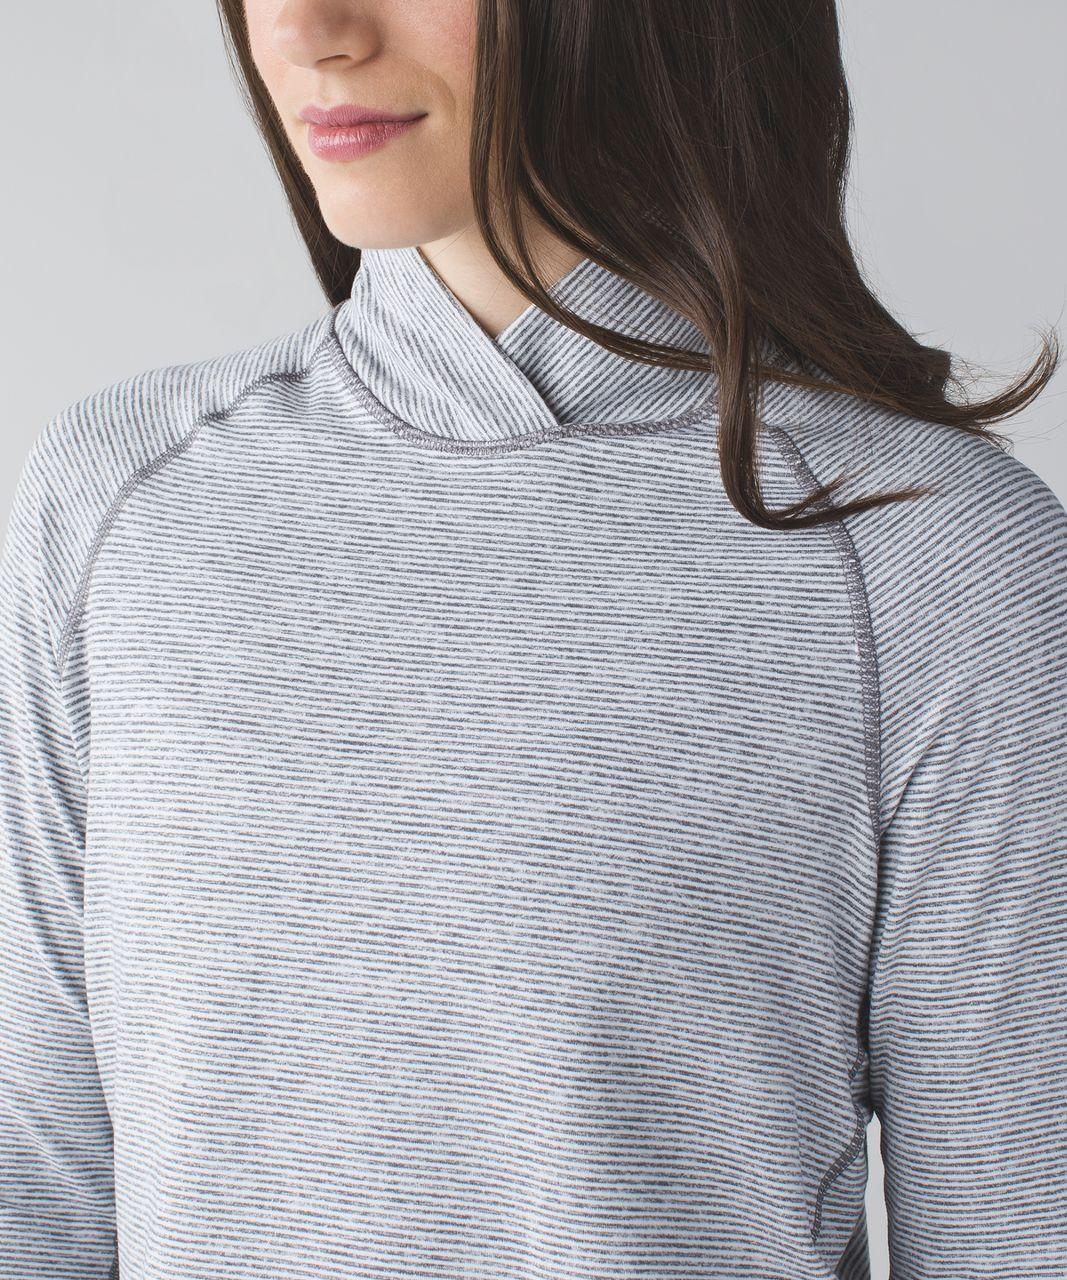 Lululemon Warm Your Core Long Sleeve Tee - Tonka Stripe Heathered Slate White